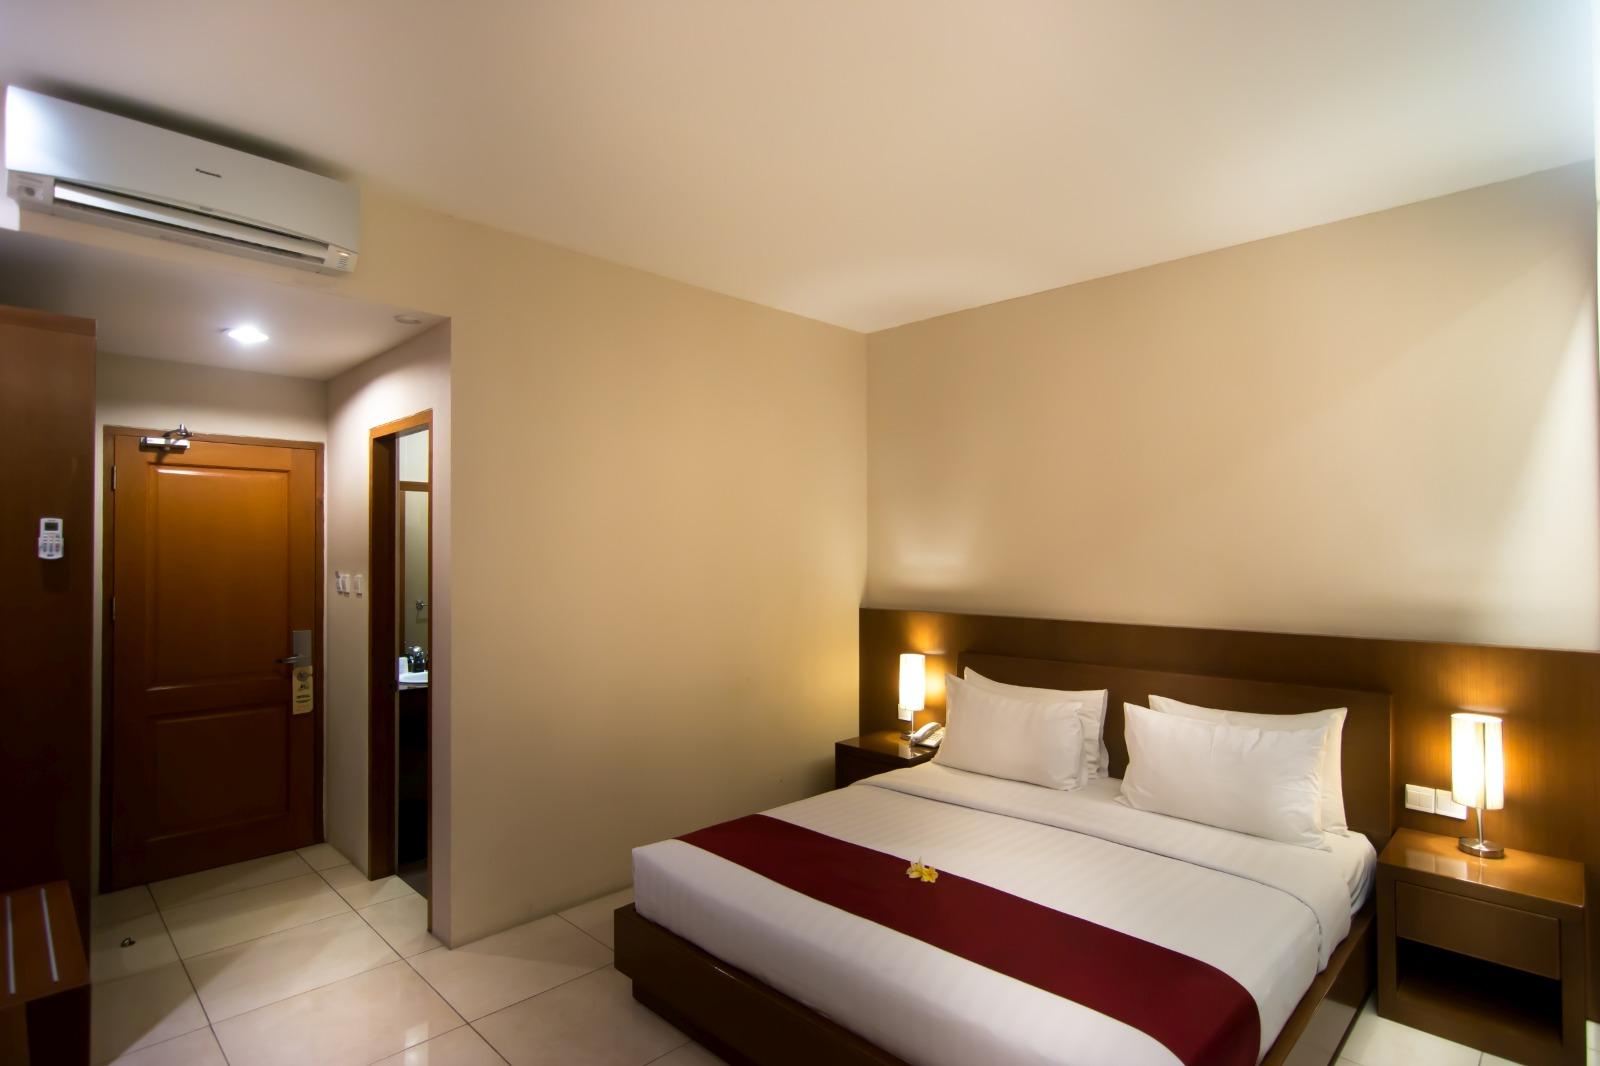 Seminyak Square Hotel Website Bali Indonesia Standard Room Kab Badung